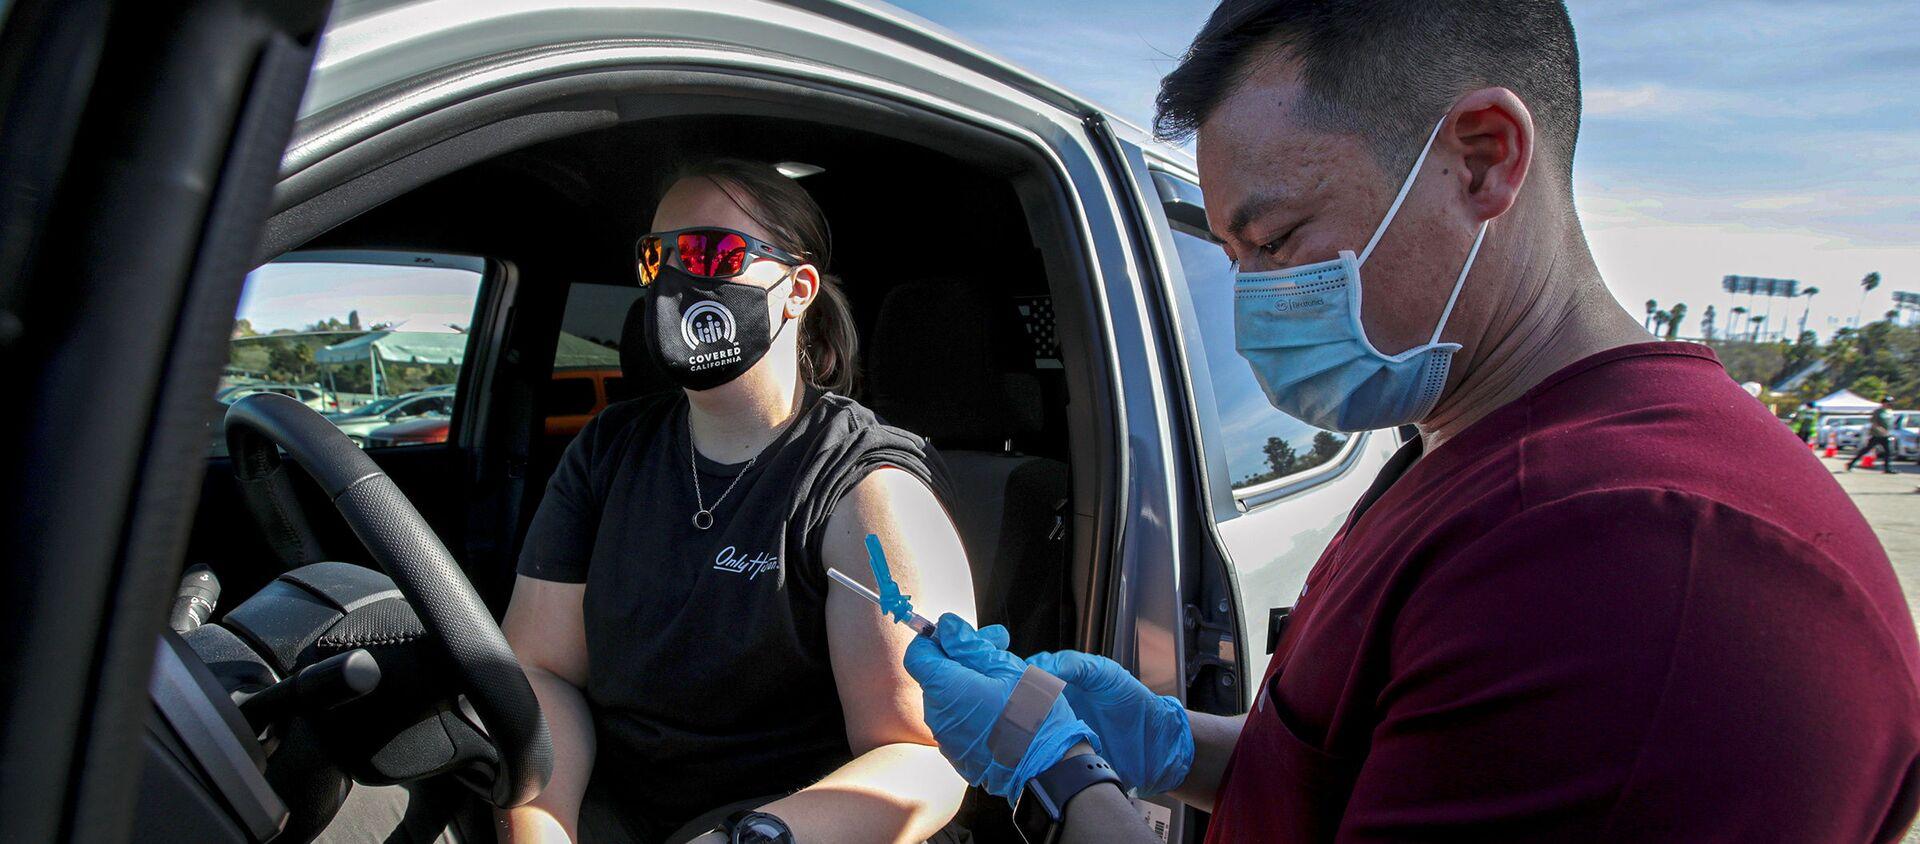 Vaccinazione di massa in California, gennaio 2021 - Sputnik Italia, 1920, 25.01.2021